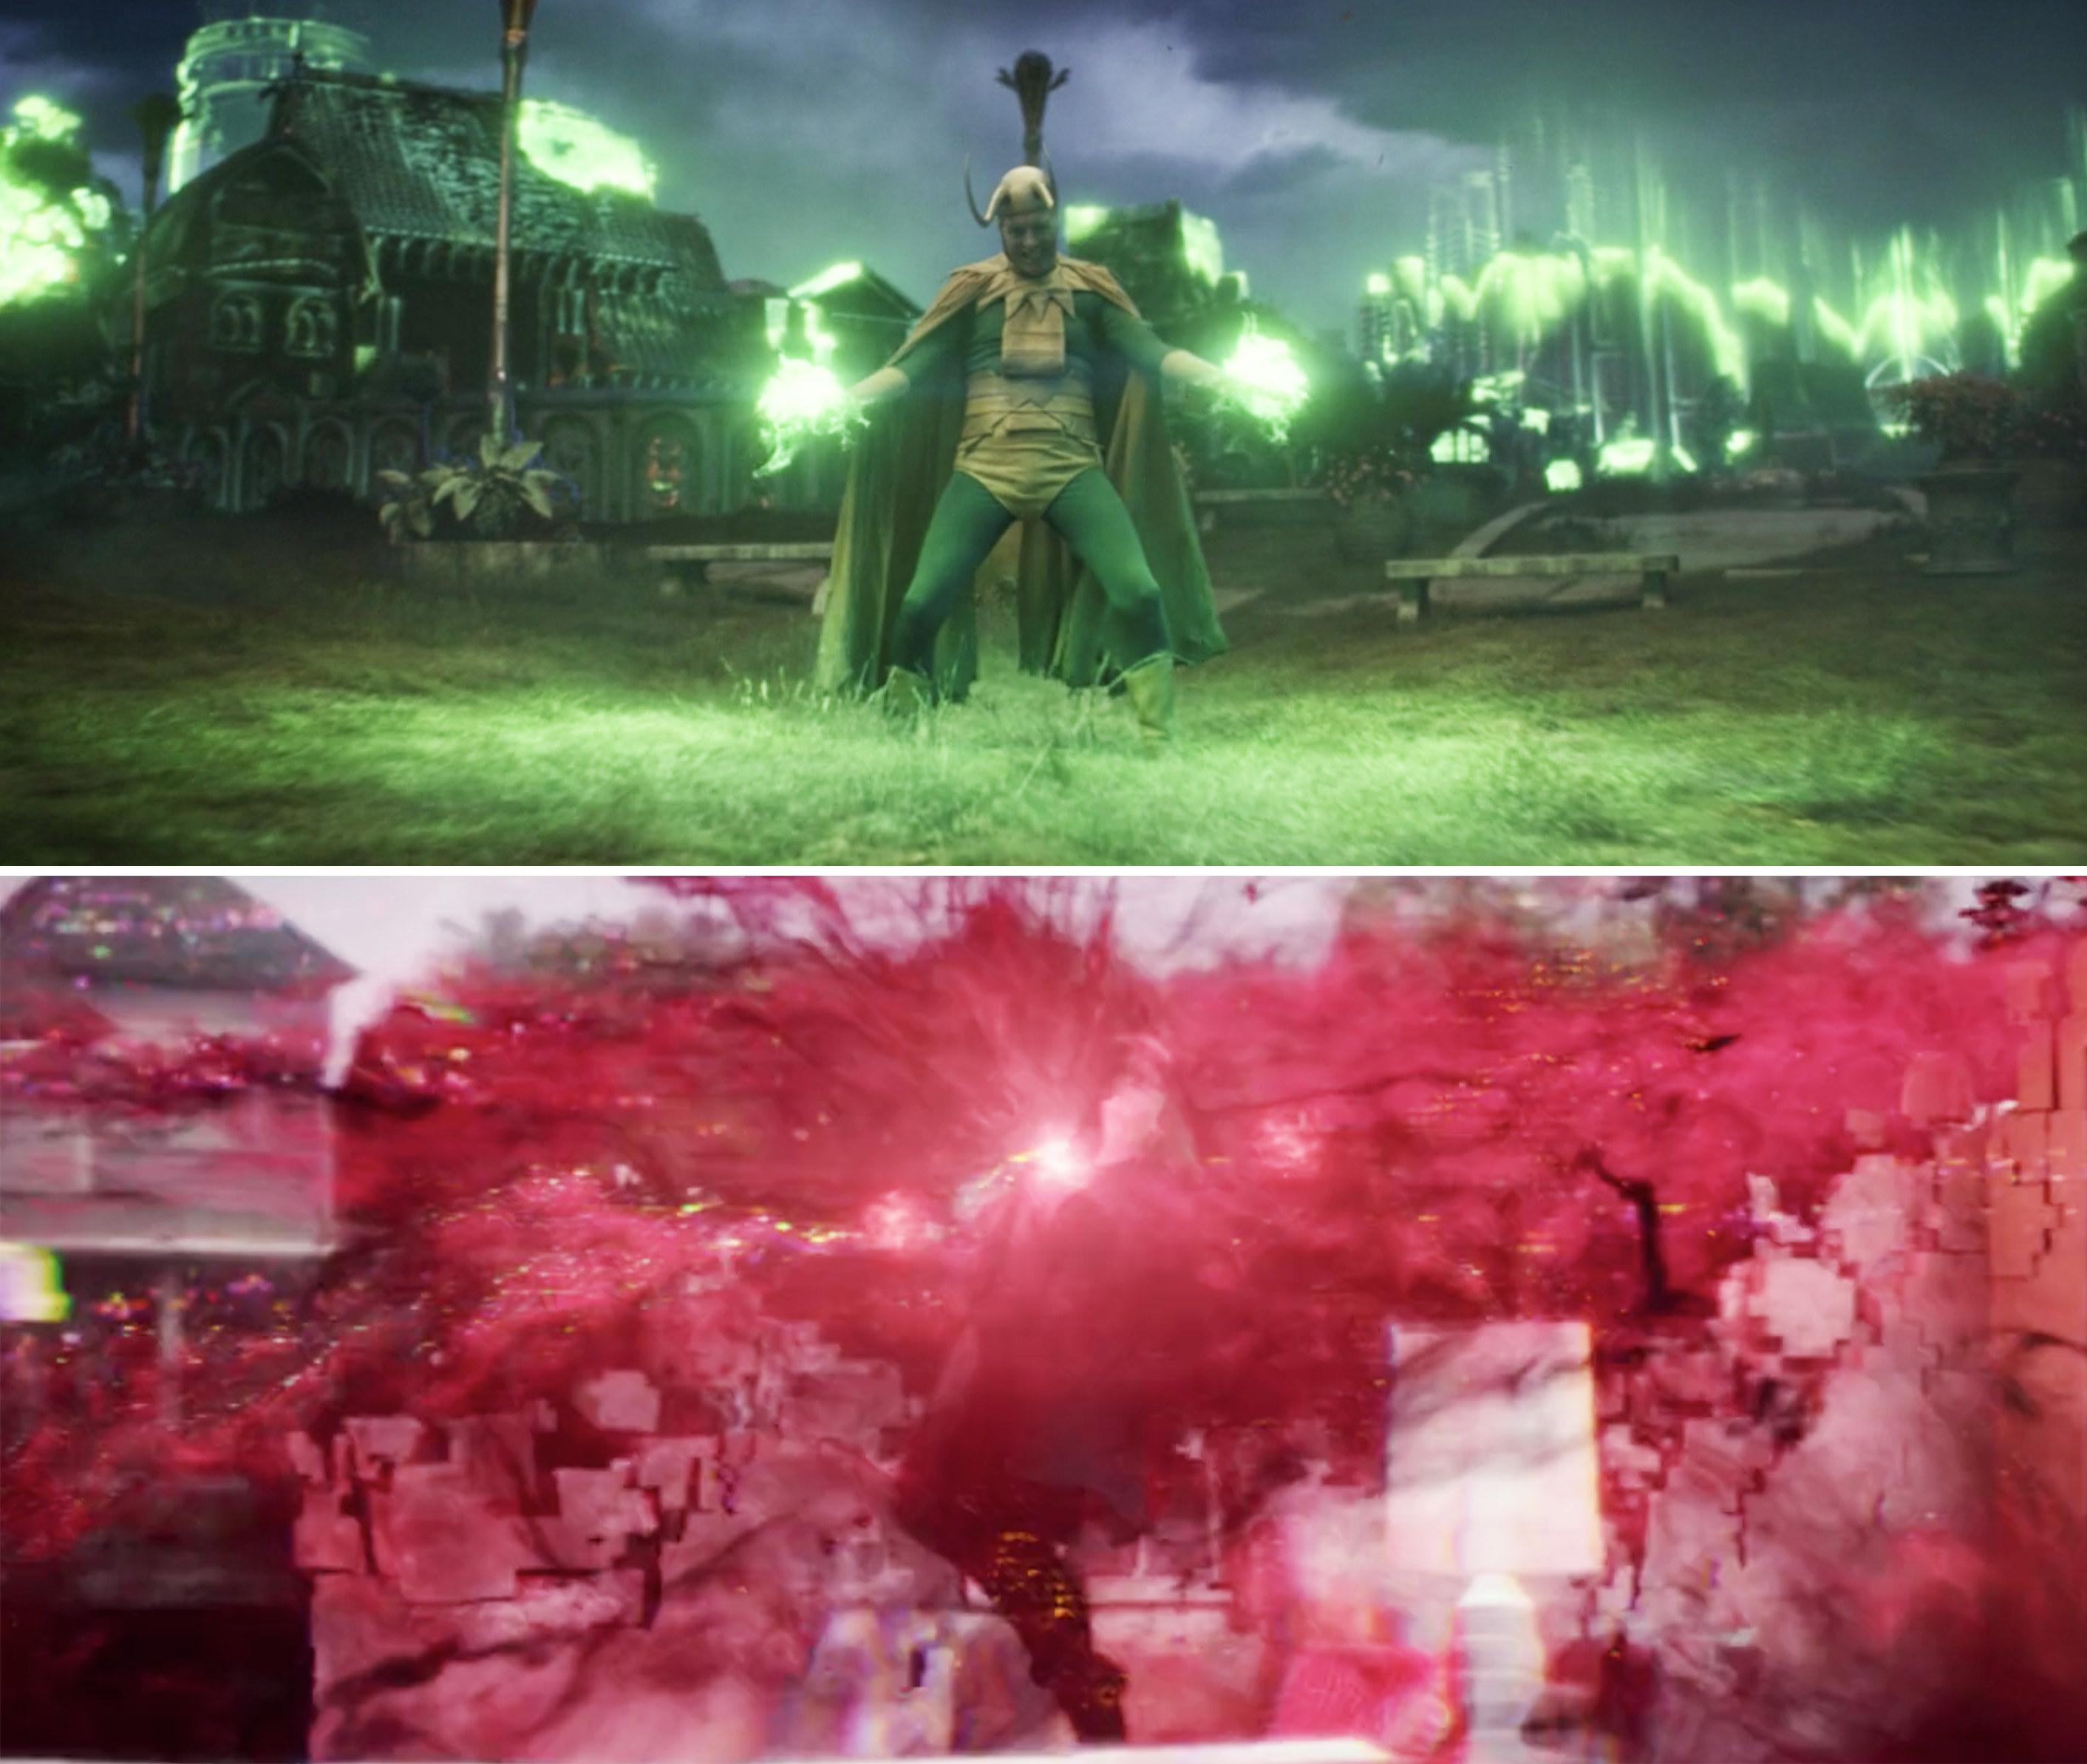 Classic Loki using his magic vs. Wanda Maximoff